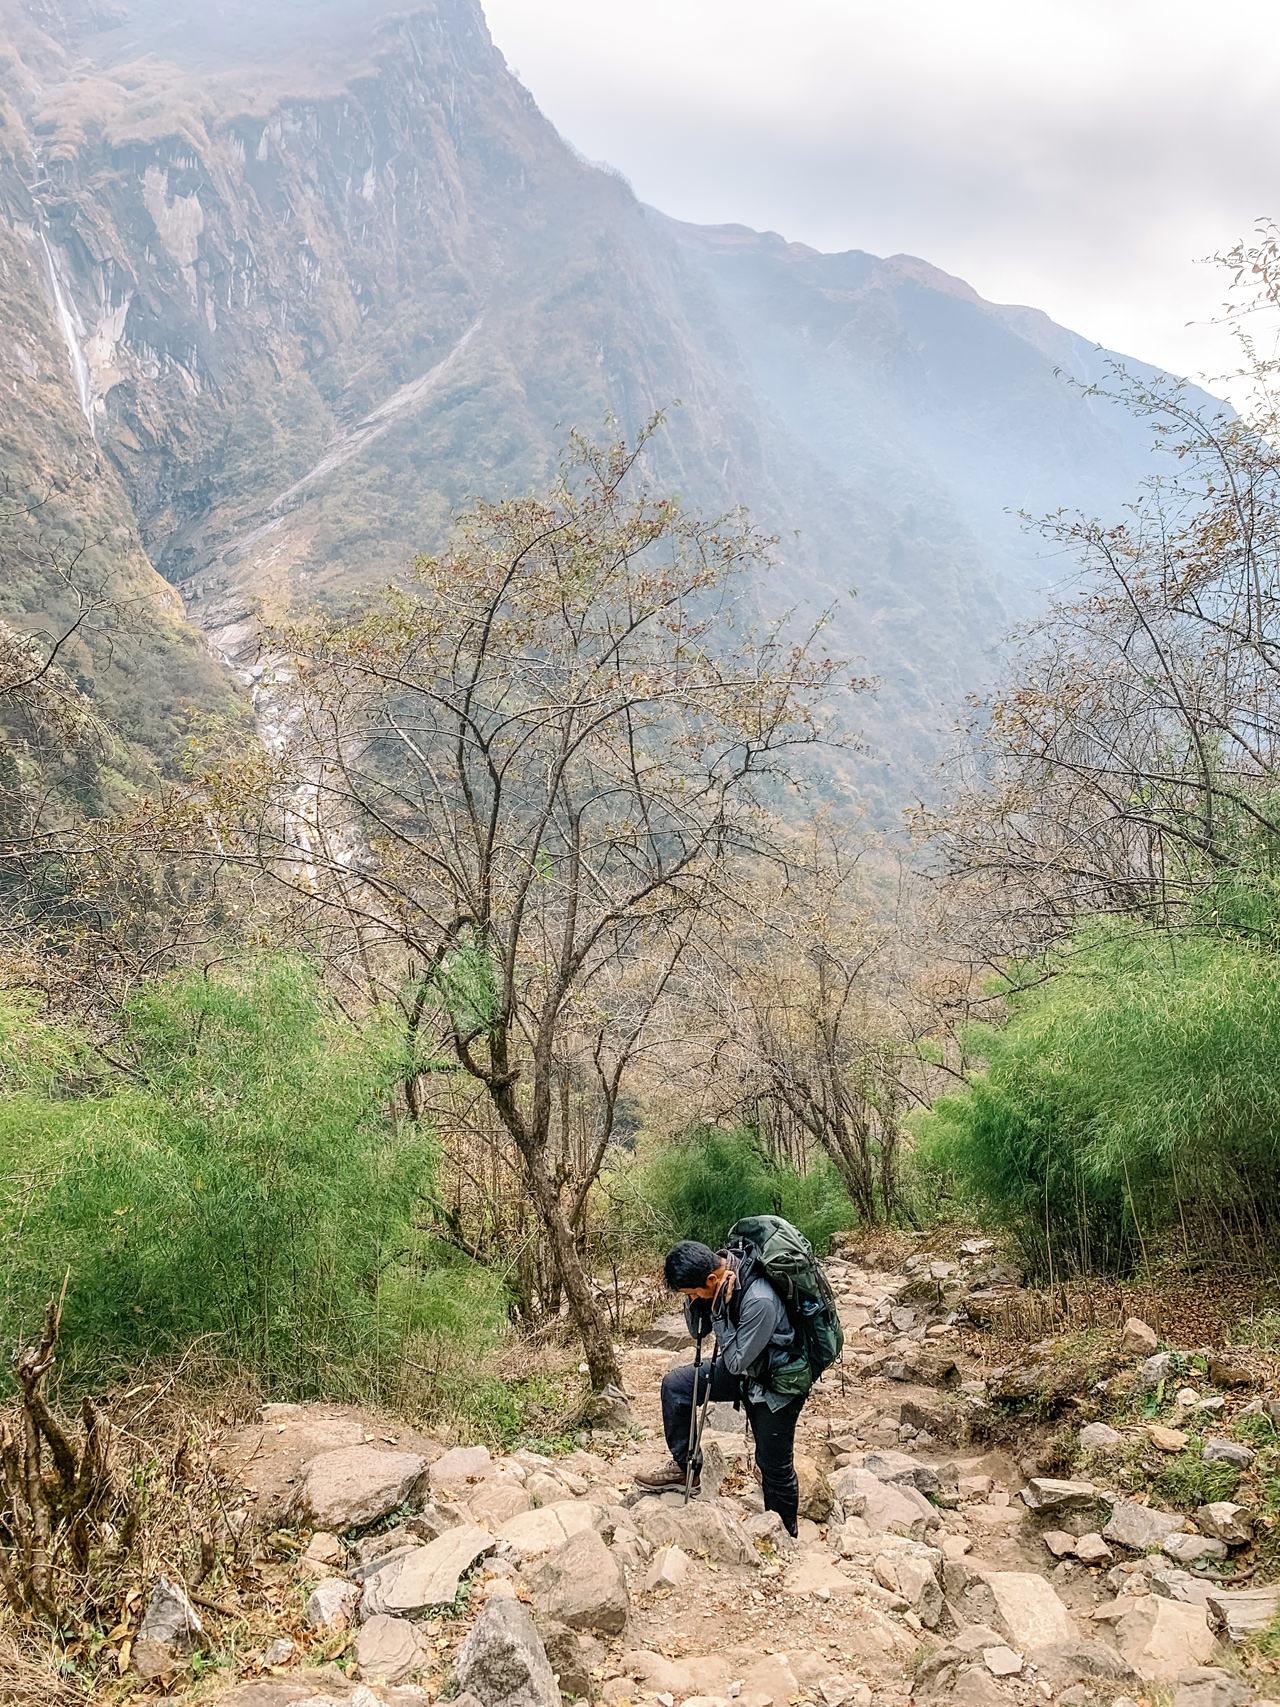 Nepal 2019 - Trekking Annapurna Base Camp 193